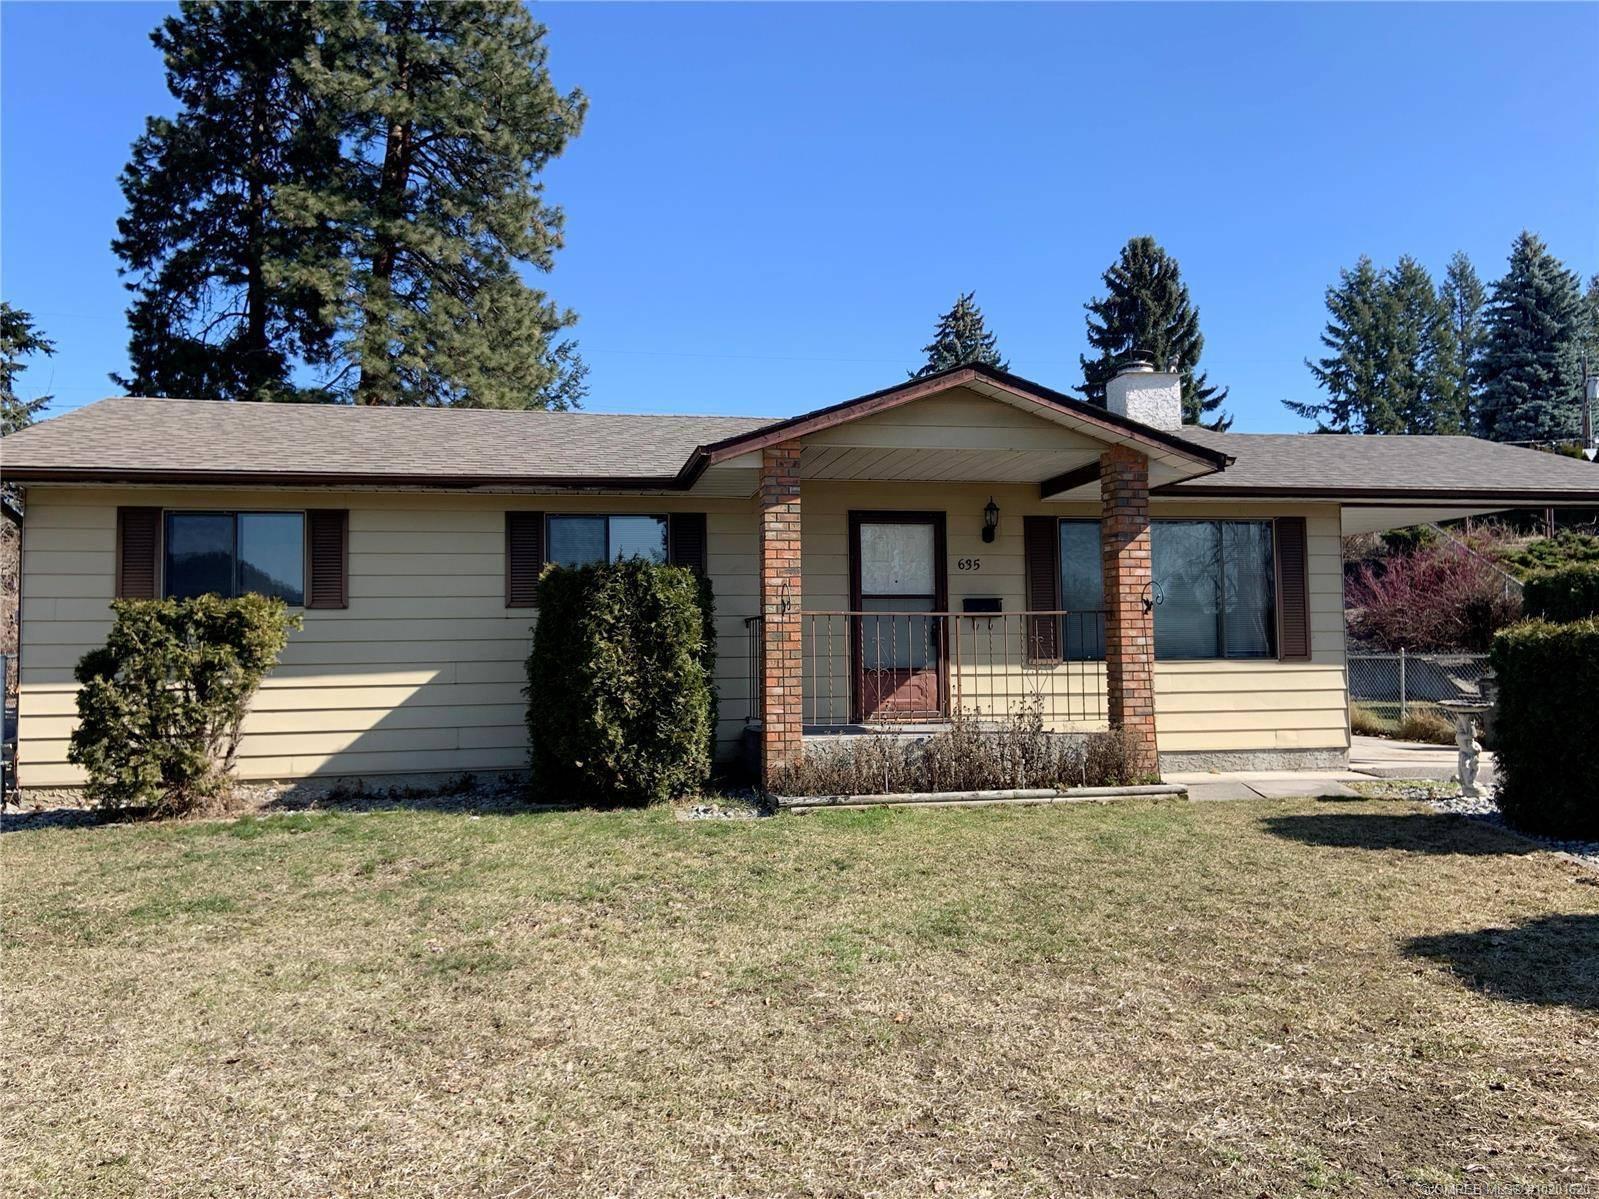 House for sale at 635 Josselyn Ct Kelowna British Columbia - MLS: 10201620